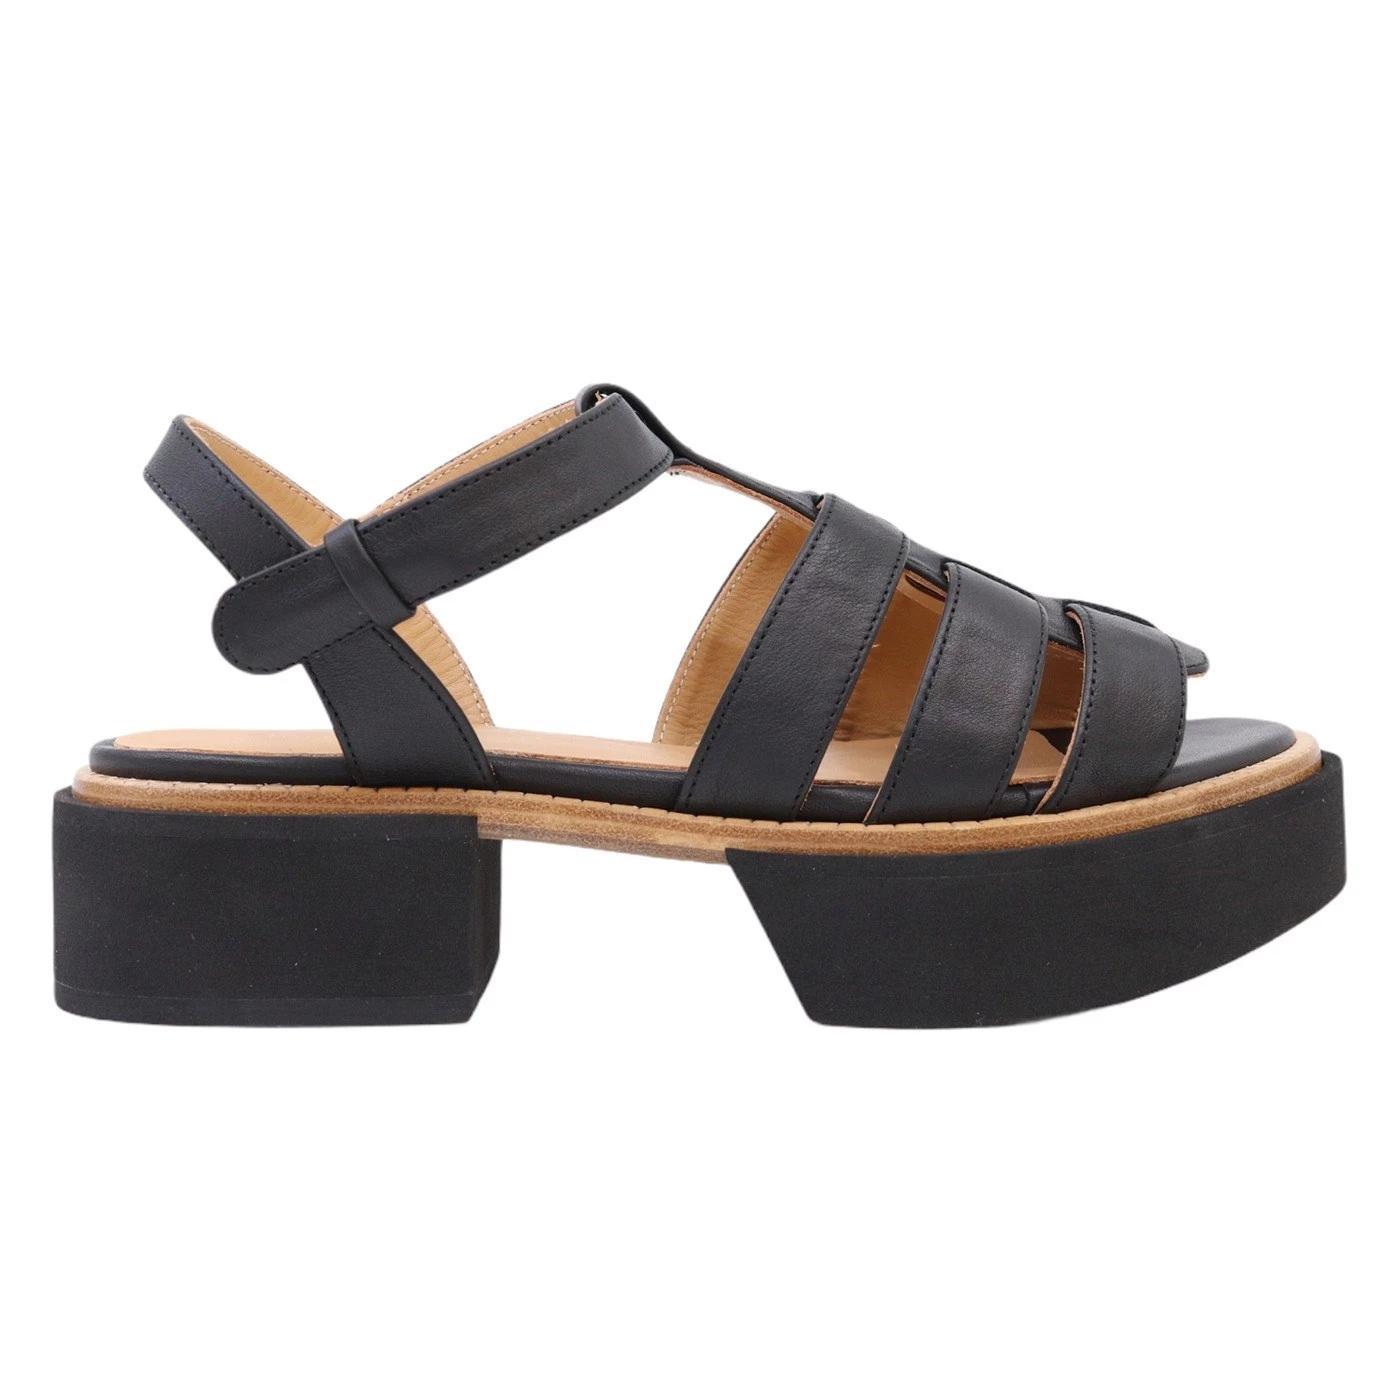 Paloma Barcelo 2072 sandalo da donna in pelle nera